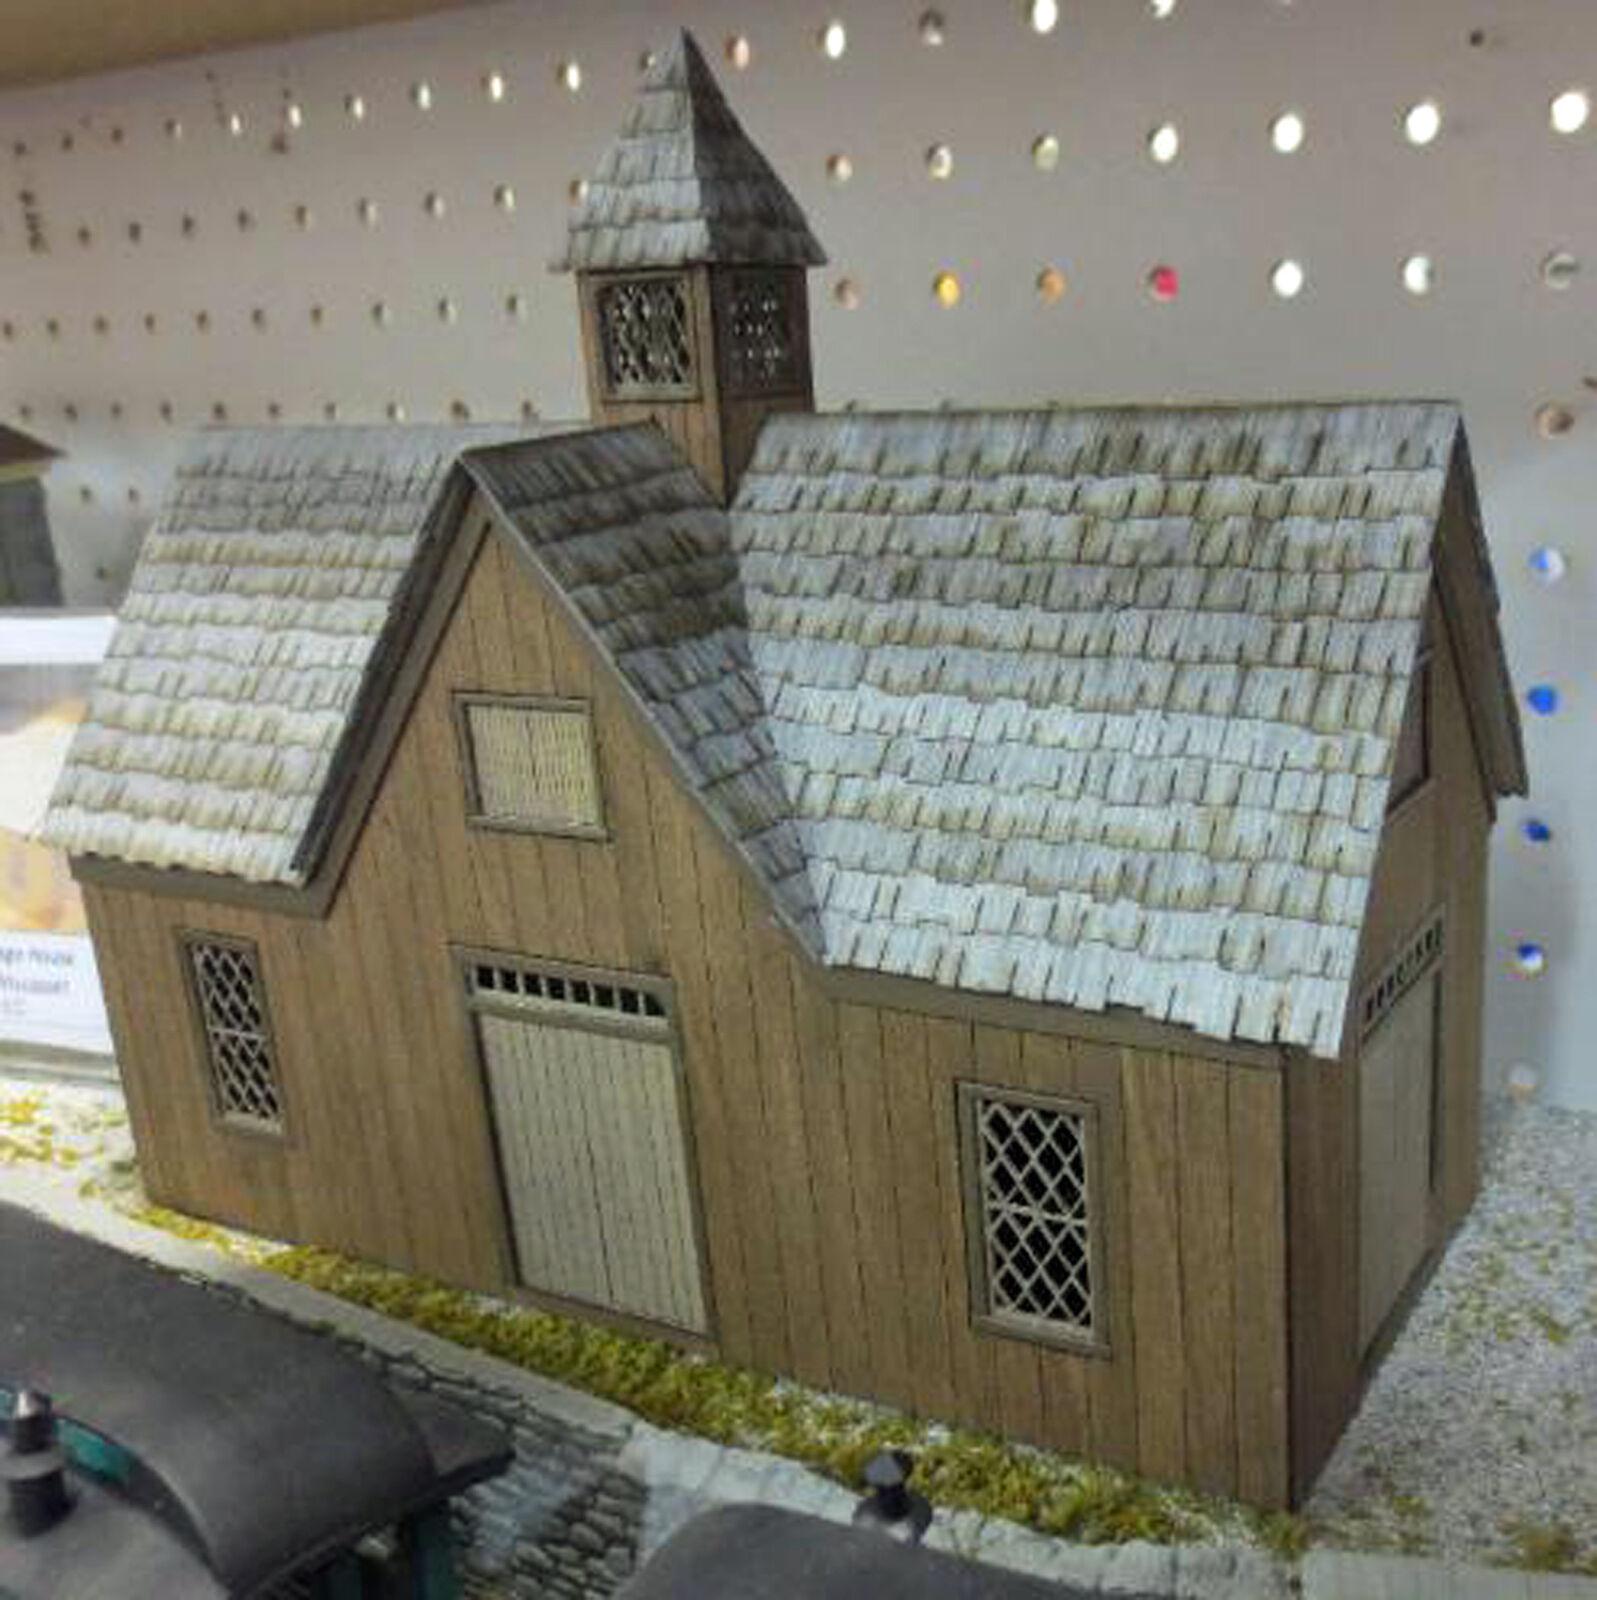 CARRIAGE HOUSE DIAMOND PANE WINDOWS O On30 Model Railroad Unptd Laser Kit DF421A